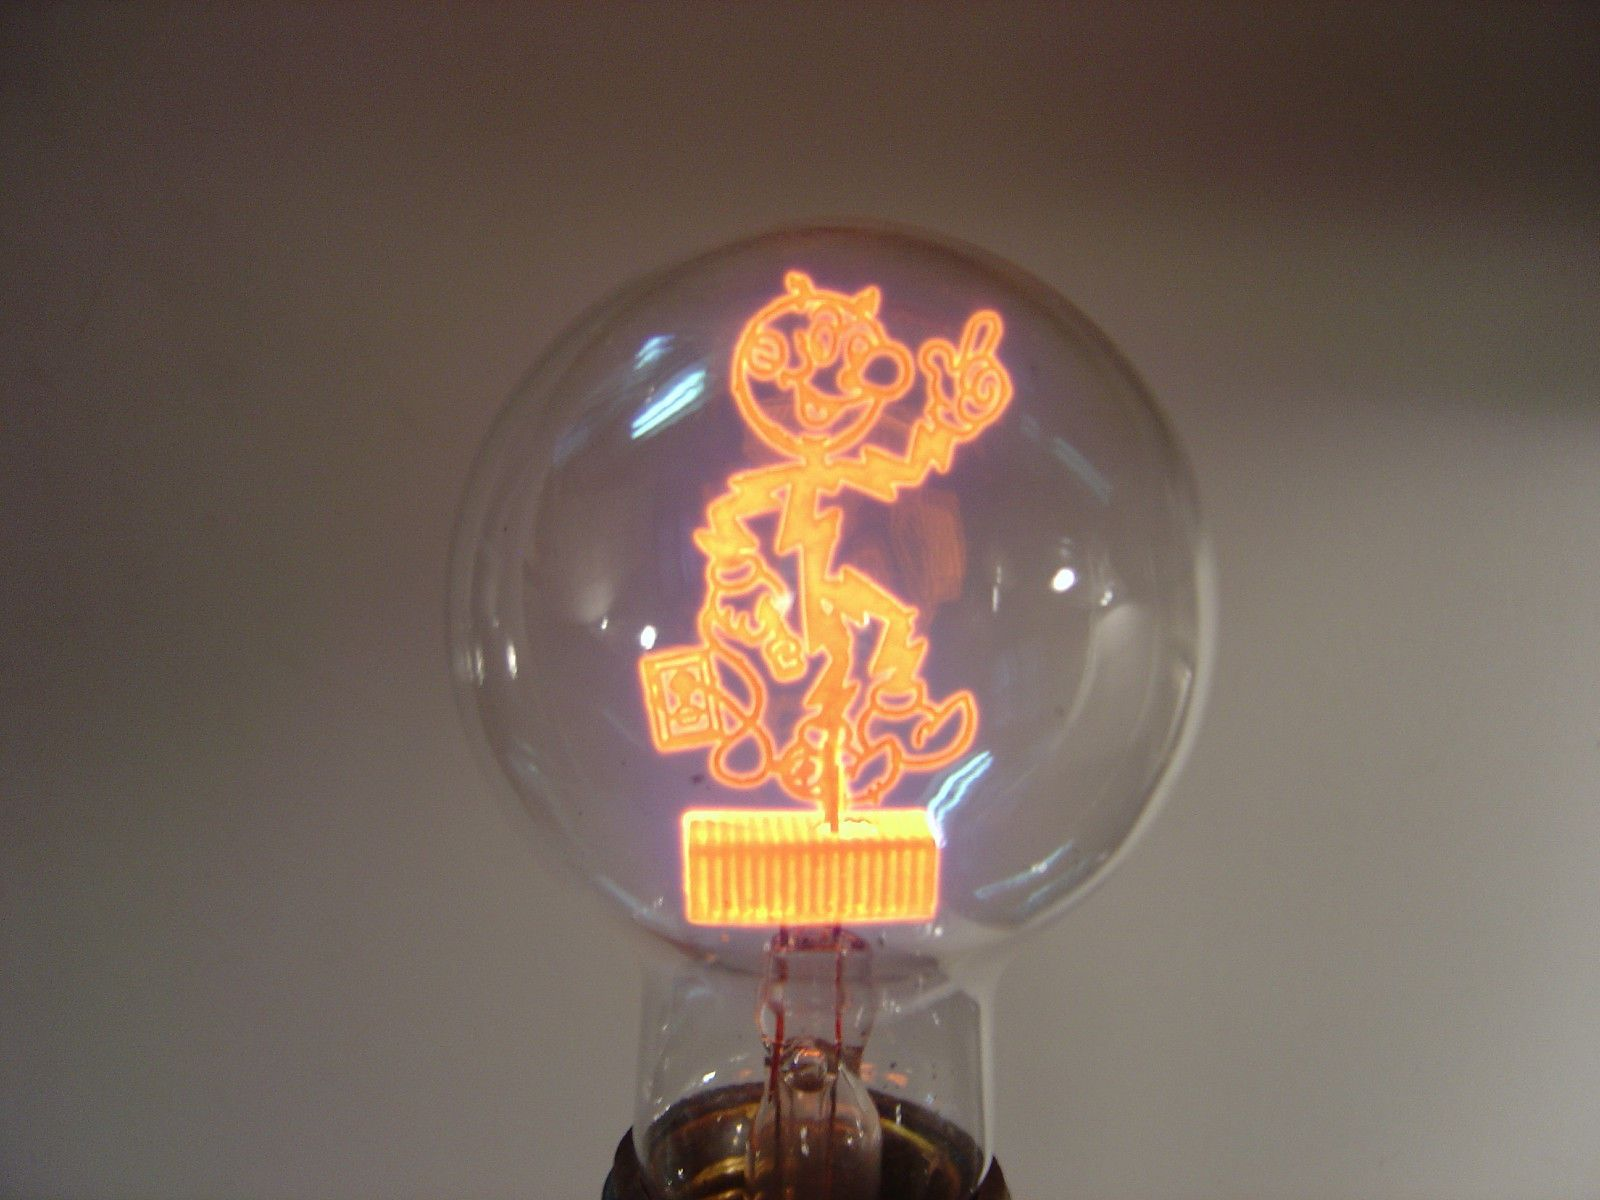 Captivating RARE Aerolux Reddy Kilowatt Figural Neon Filament Light Bulb (1940u0027s)